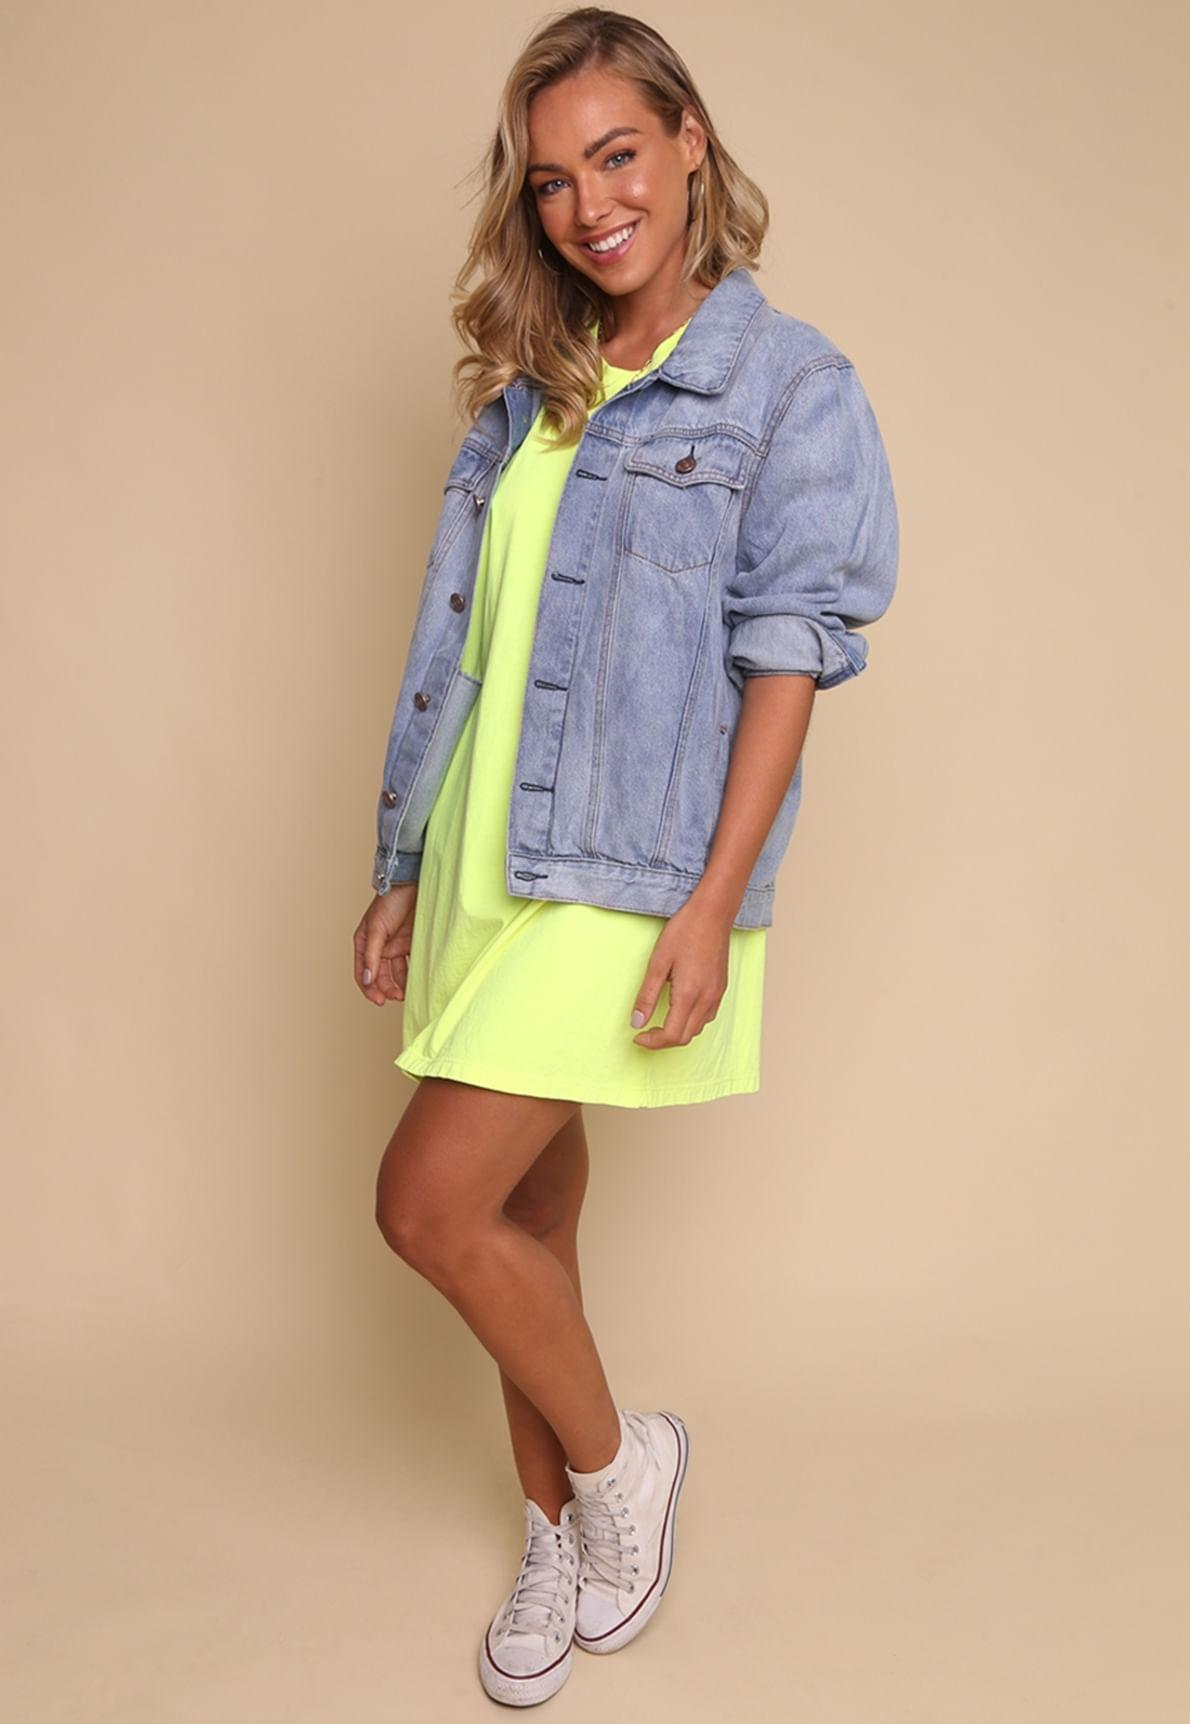 30363-vestido-camiseta-neon-california-days-mundo-lolita-05